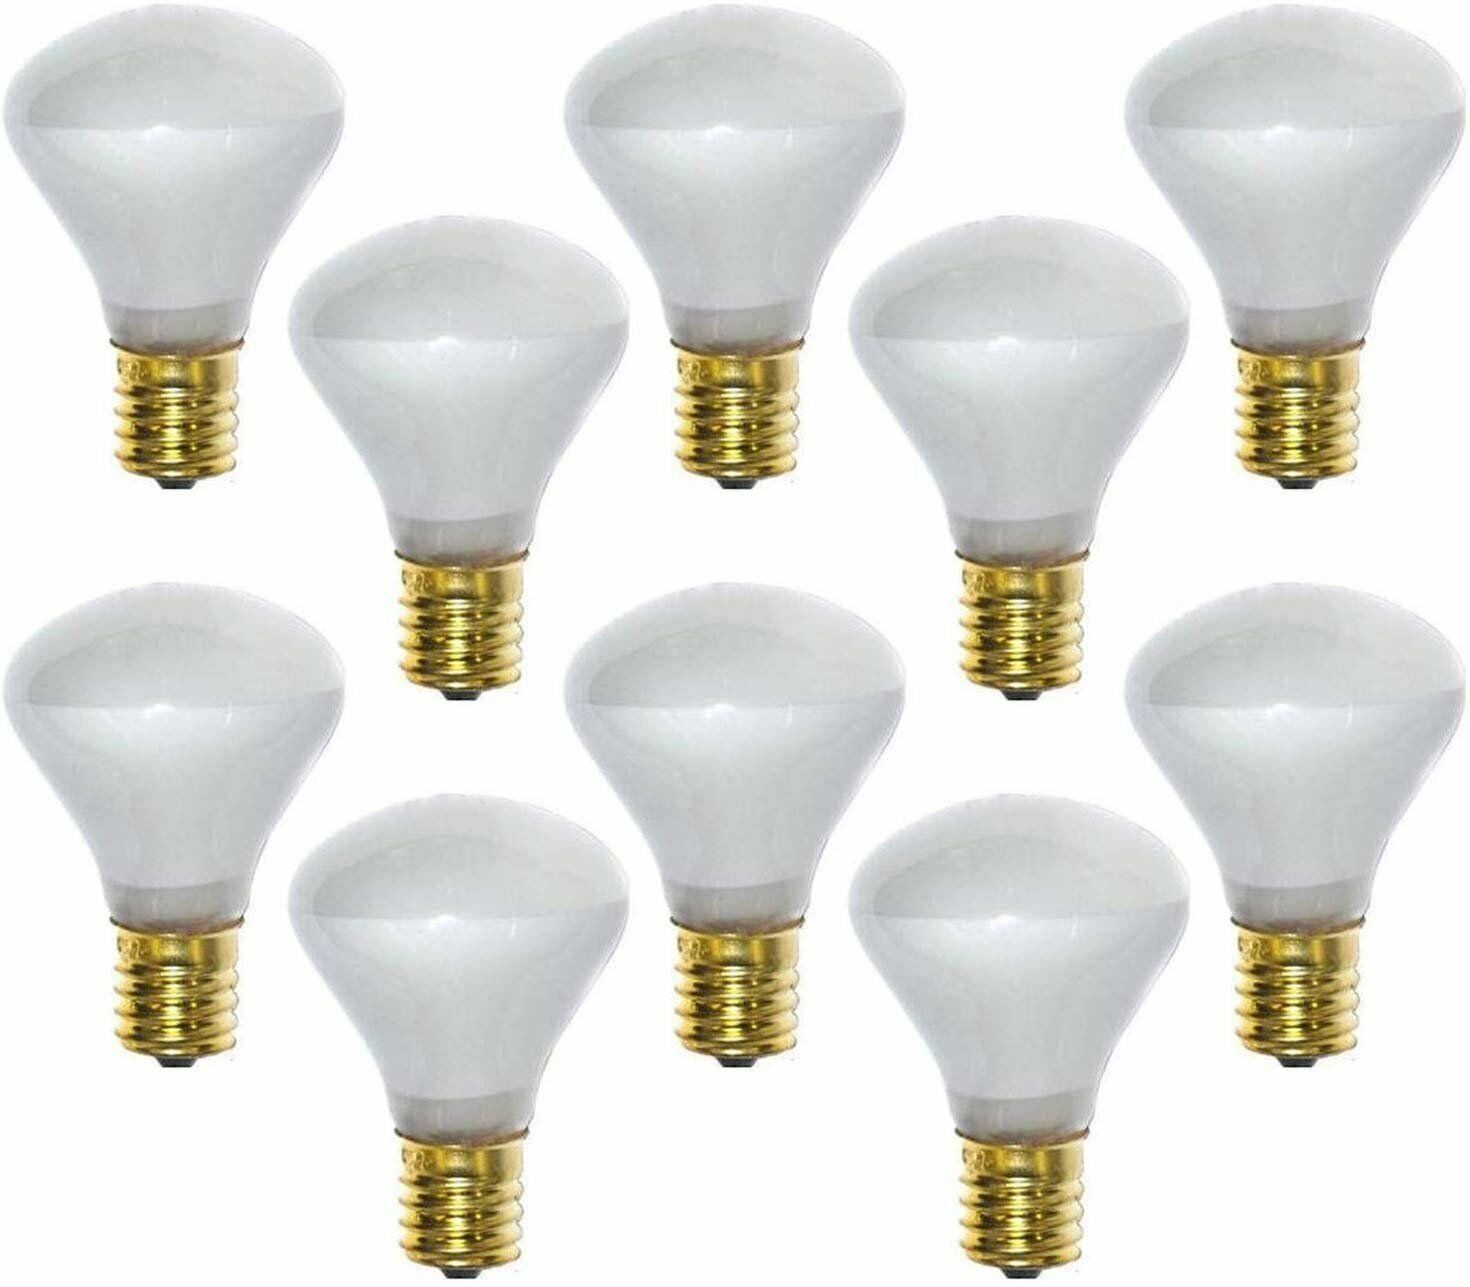 Ikea Cfl R14 E17 7w Light Bulb For